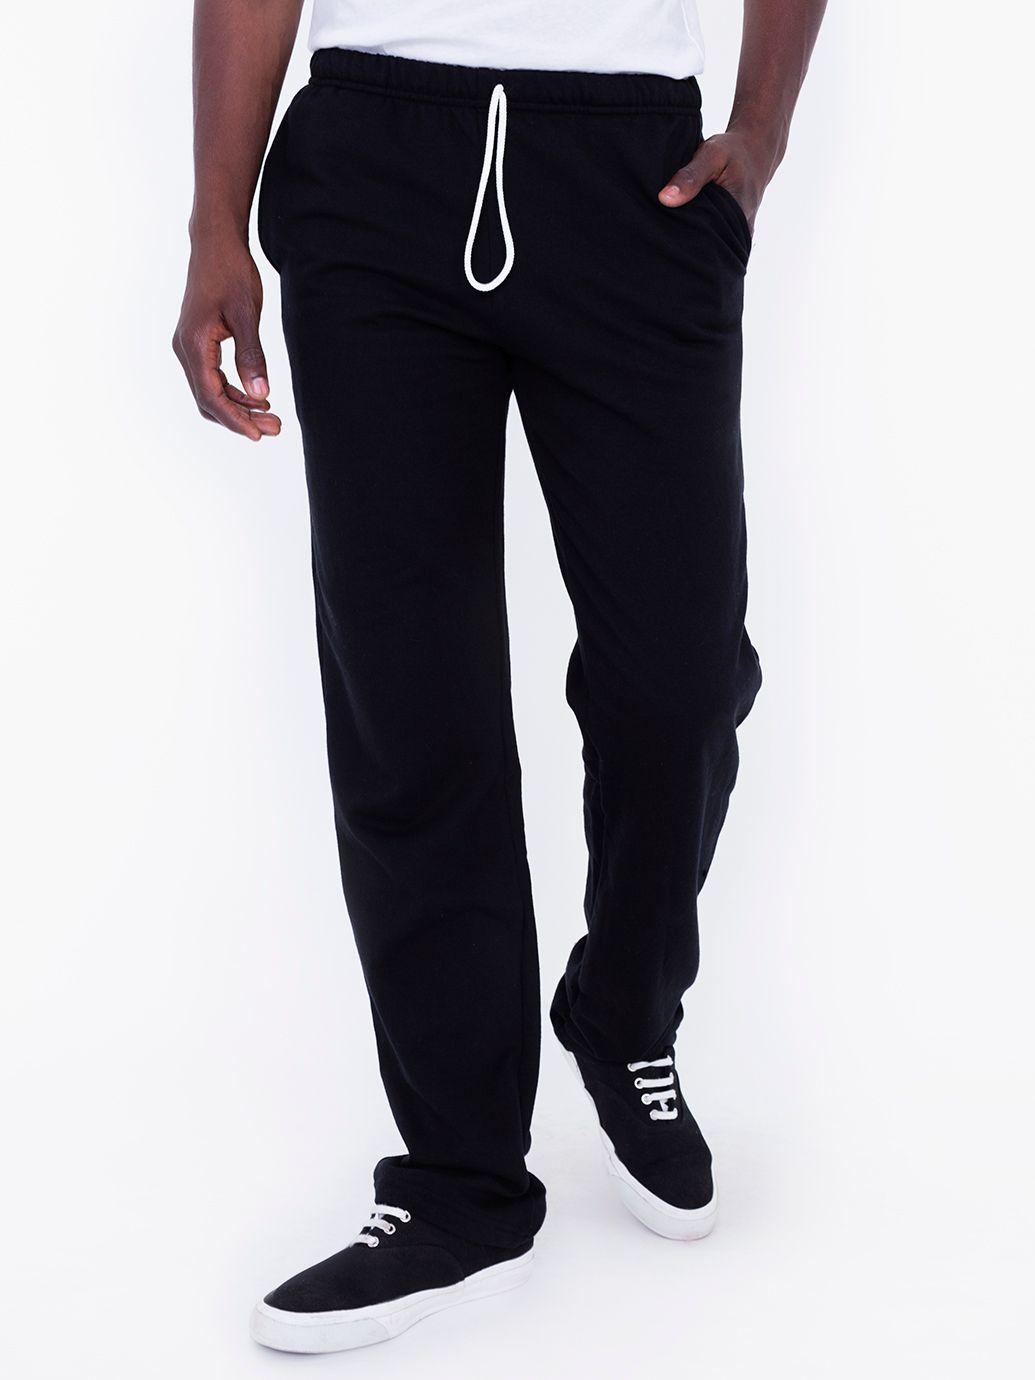 American Apparel Mens California Fleece Slim Fit Pants in Black, White, or Navy